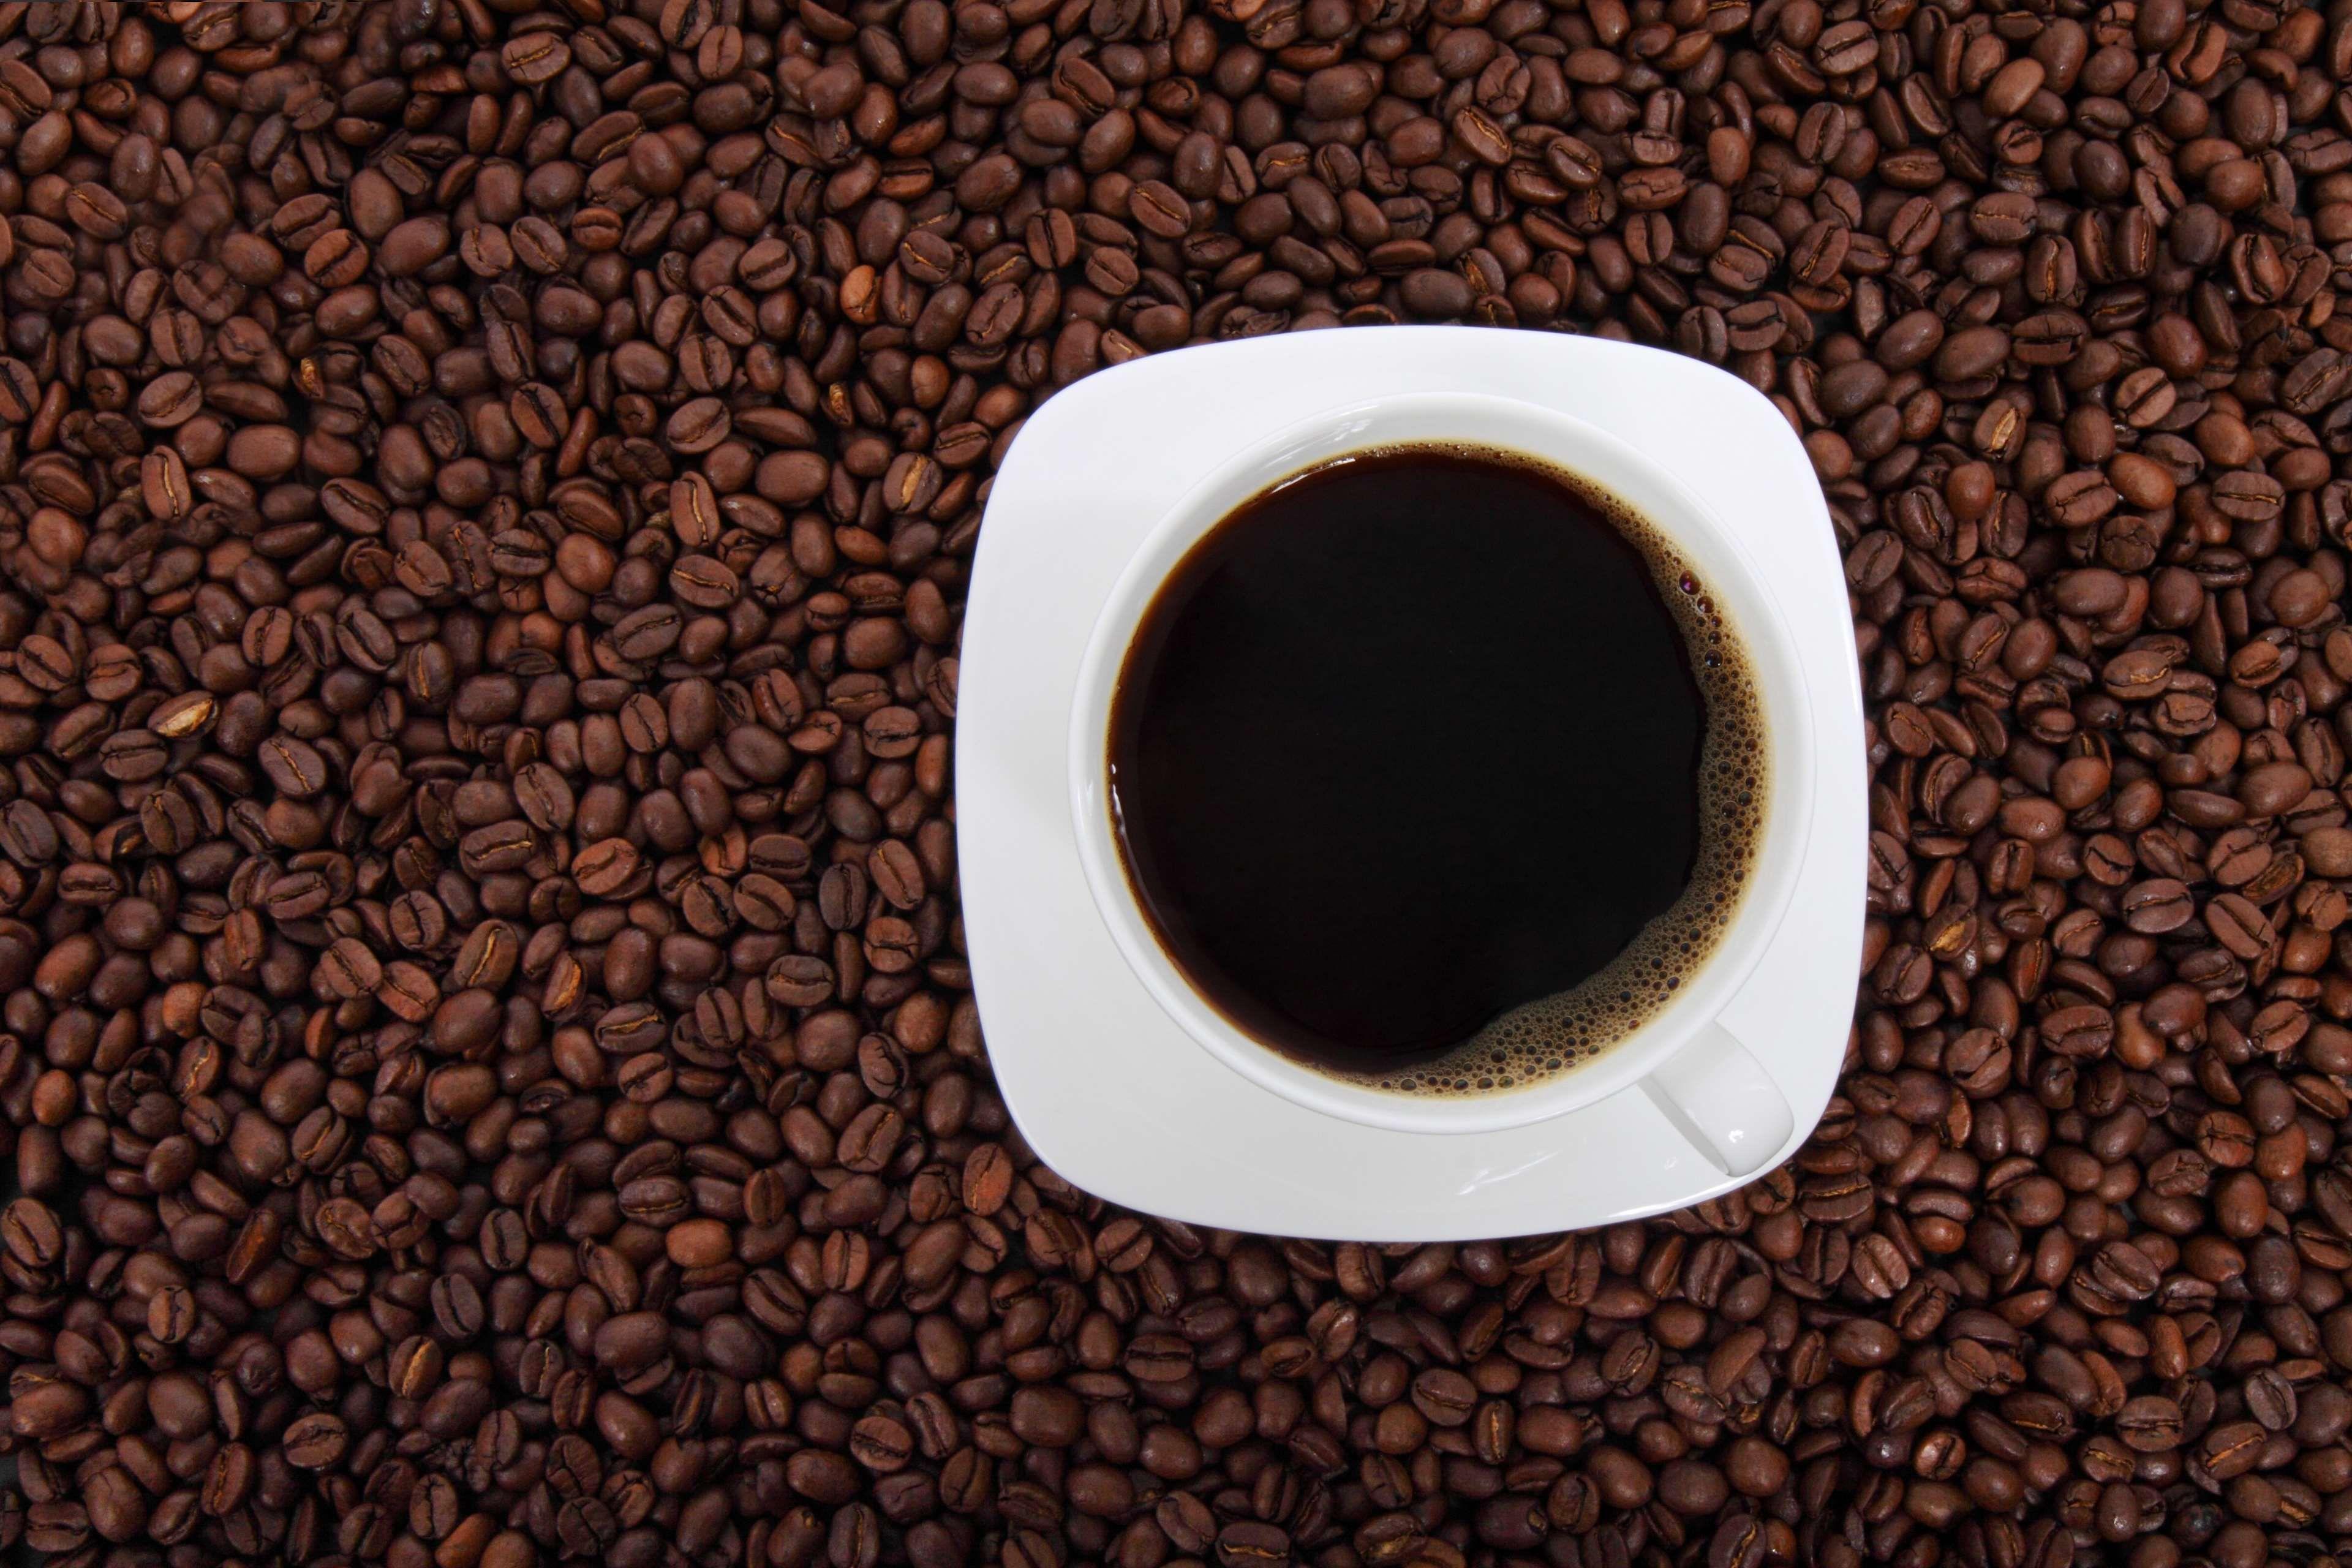 beans beverage black coffee caffeine coffee coffee